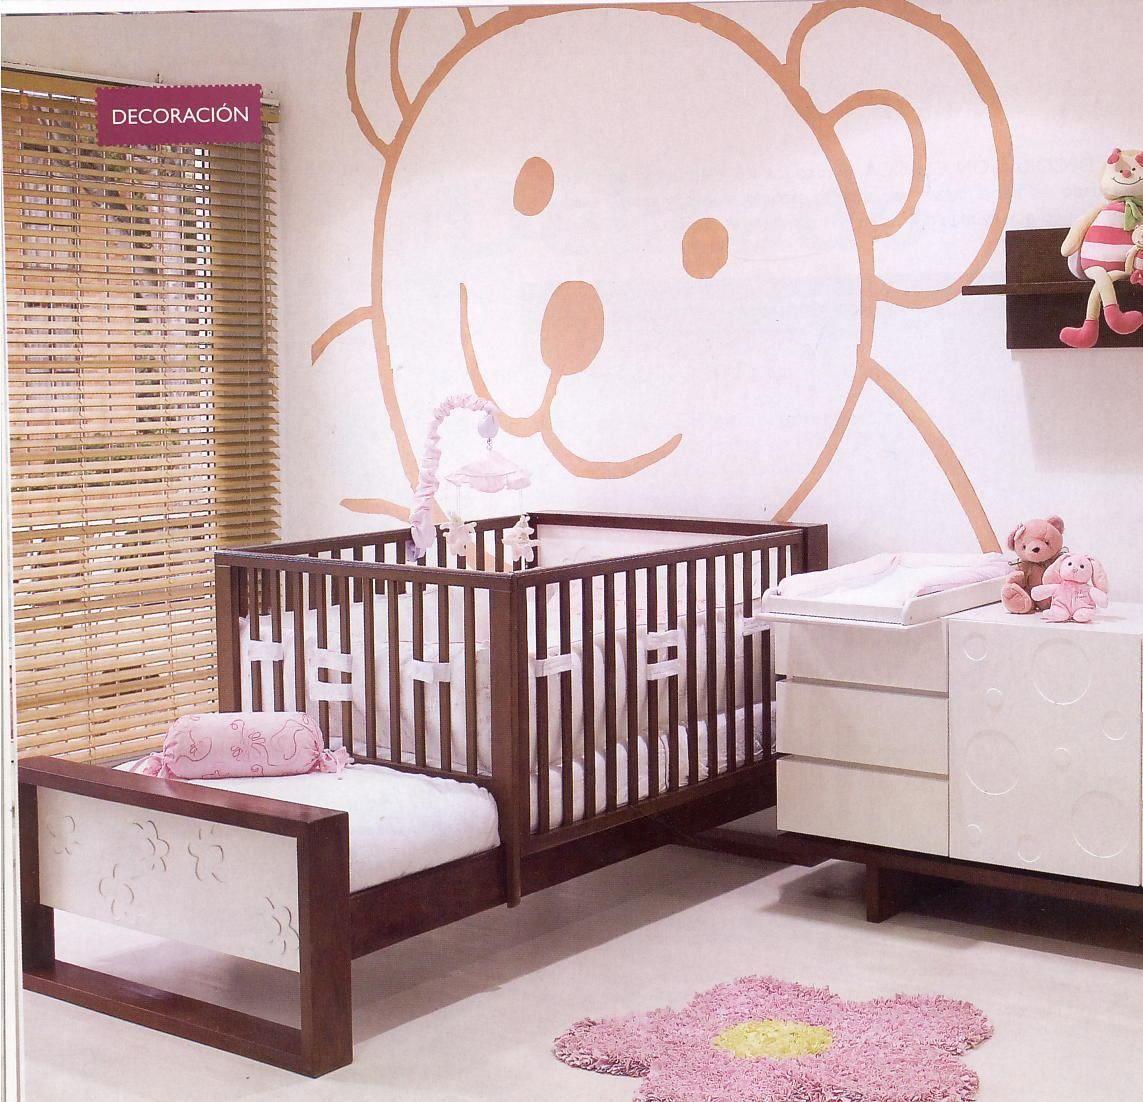 Moises cunas para bebés Disney - Imagui | cunas | Pinterest | Babies ...